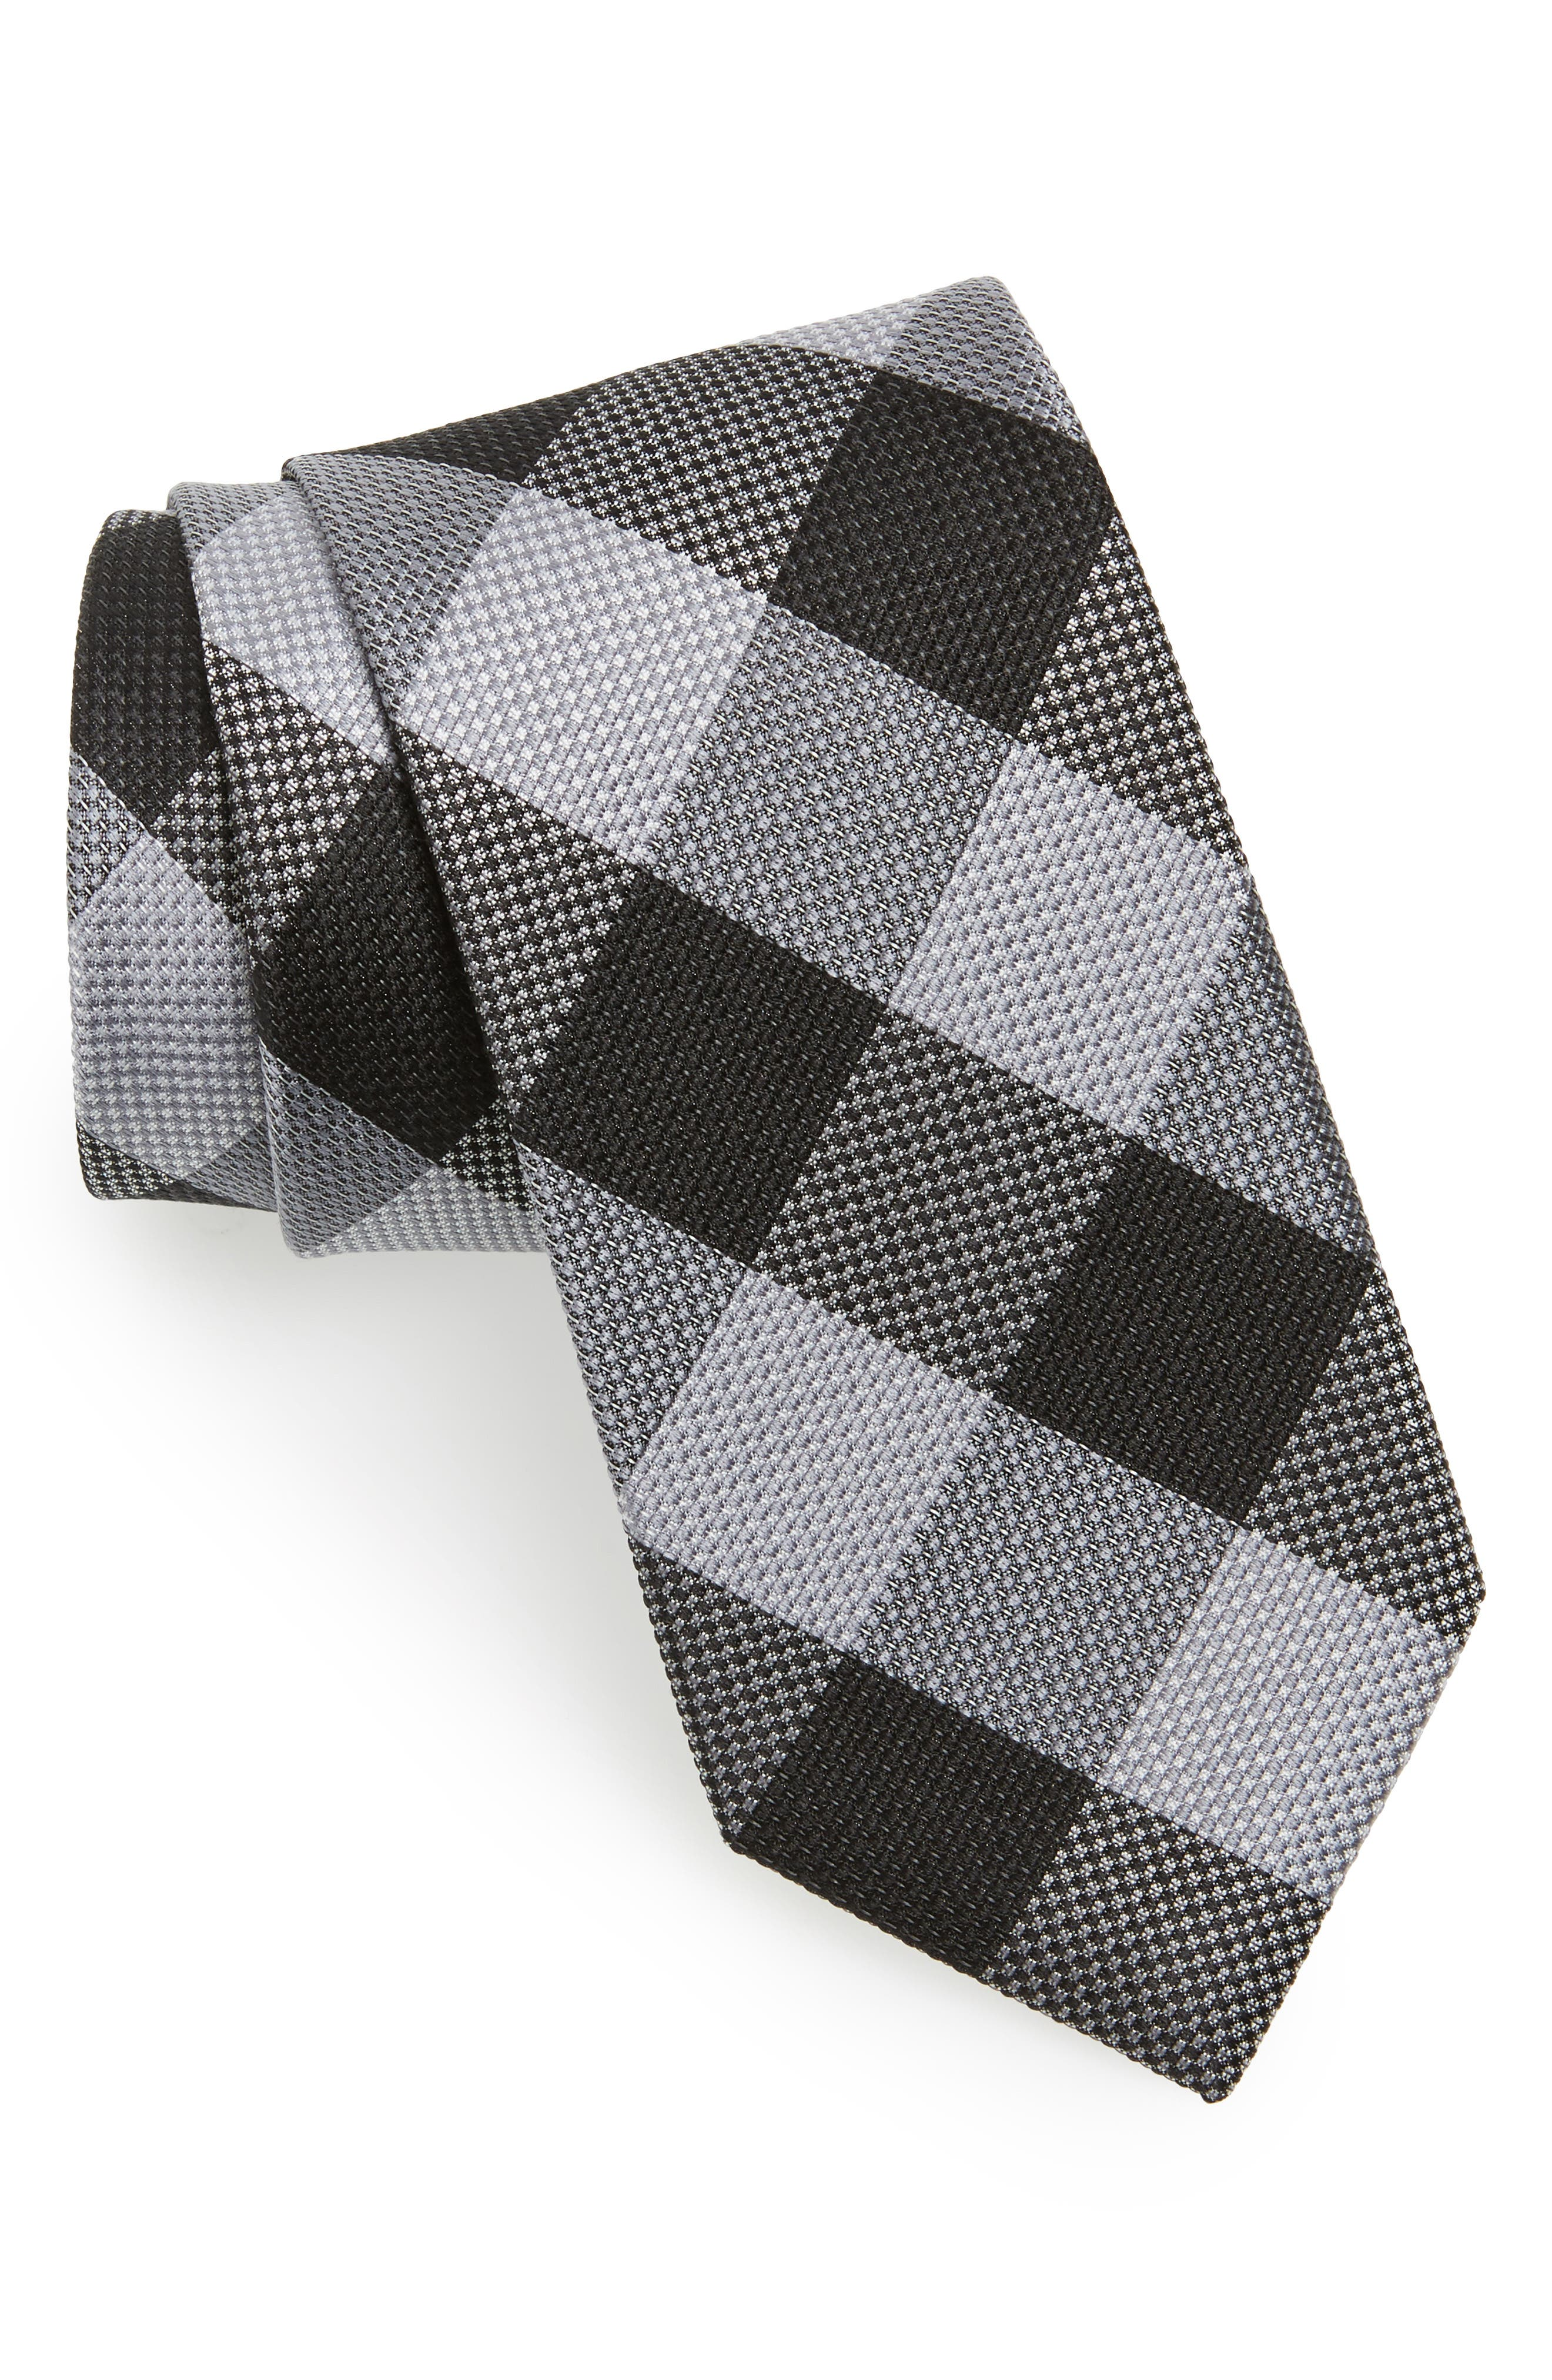 Alternate Image 1 Selected - Calibrate Check Silk Tie